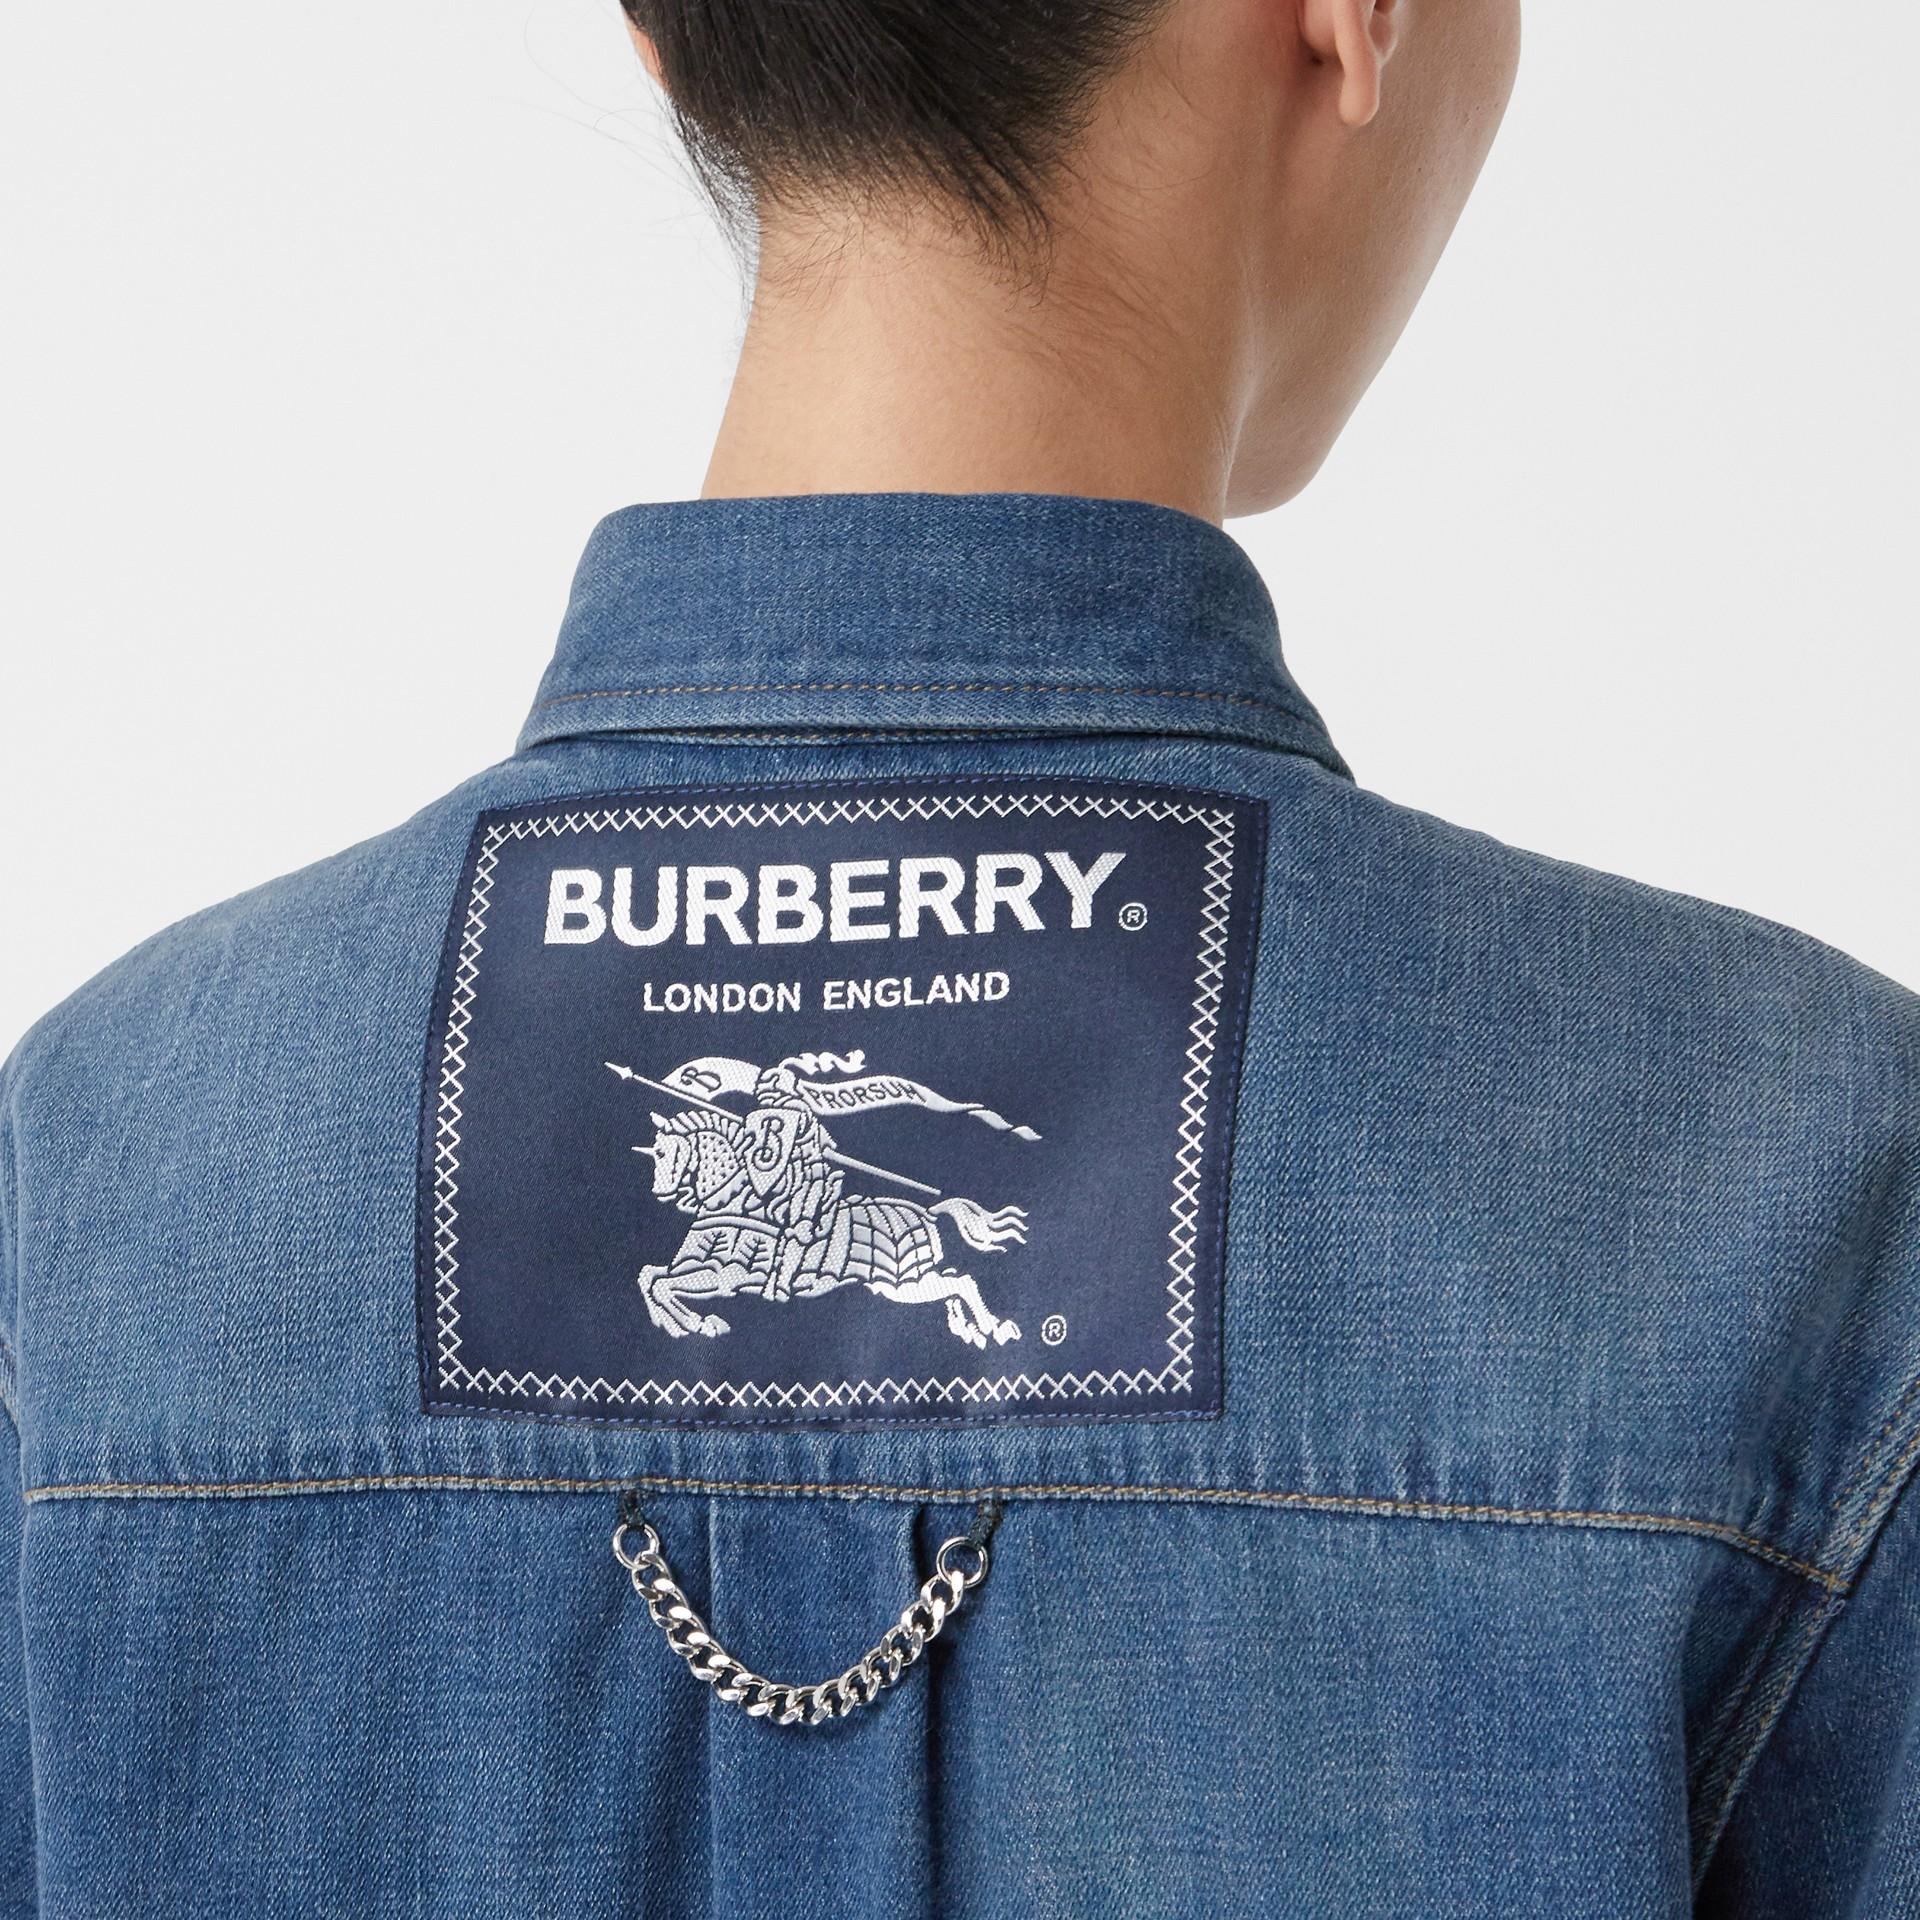 Logo Appliqué Denim Shirt in Indigo - Women | Burberry - gallery image 1